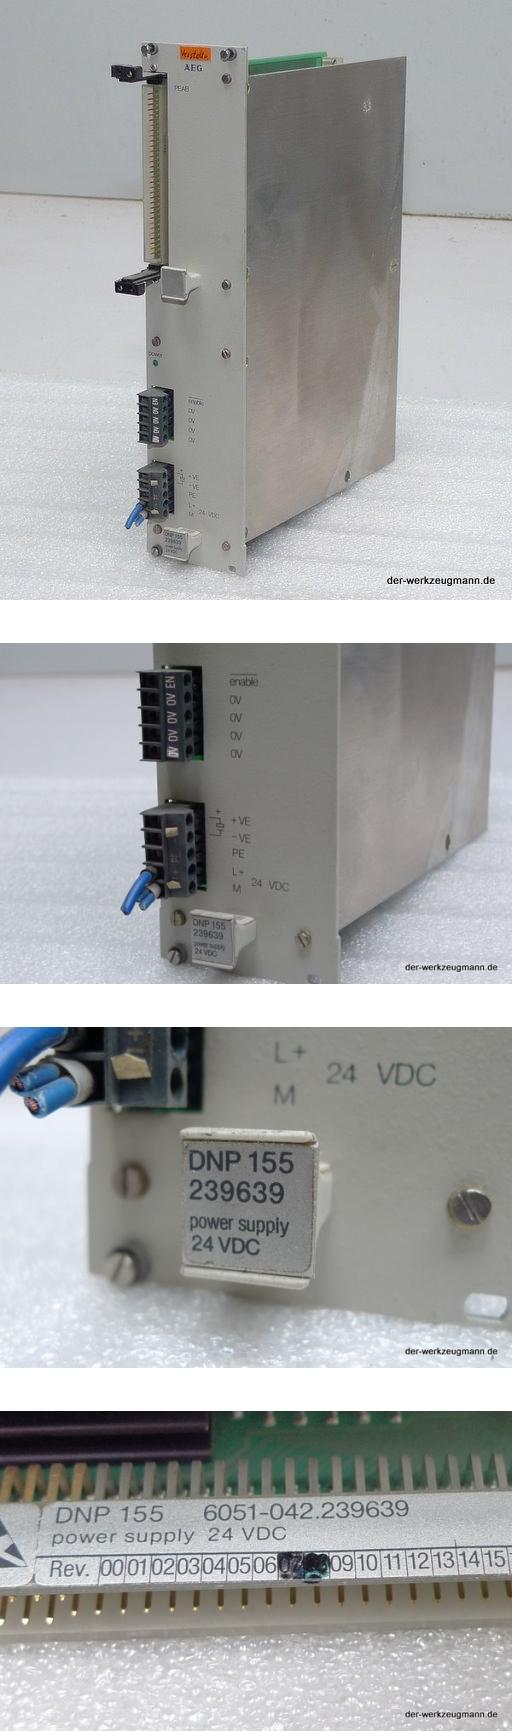 AEG Einbaukarte DNP 155 Stromversorgung 24V DC 239639